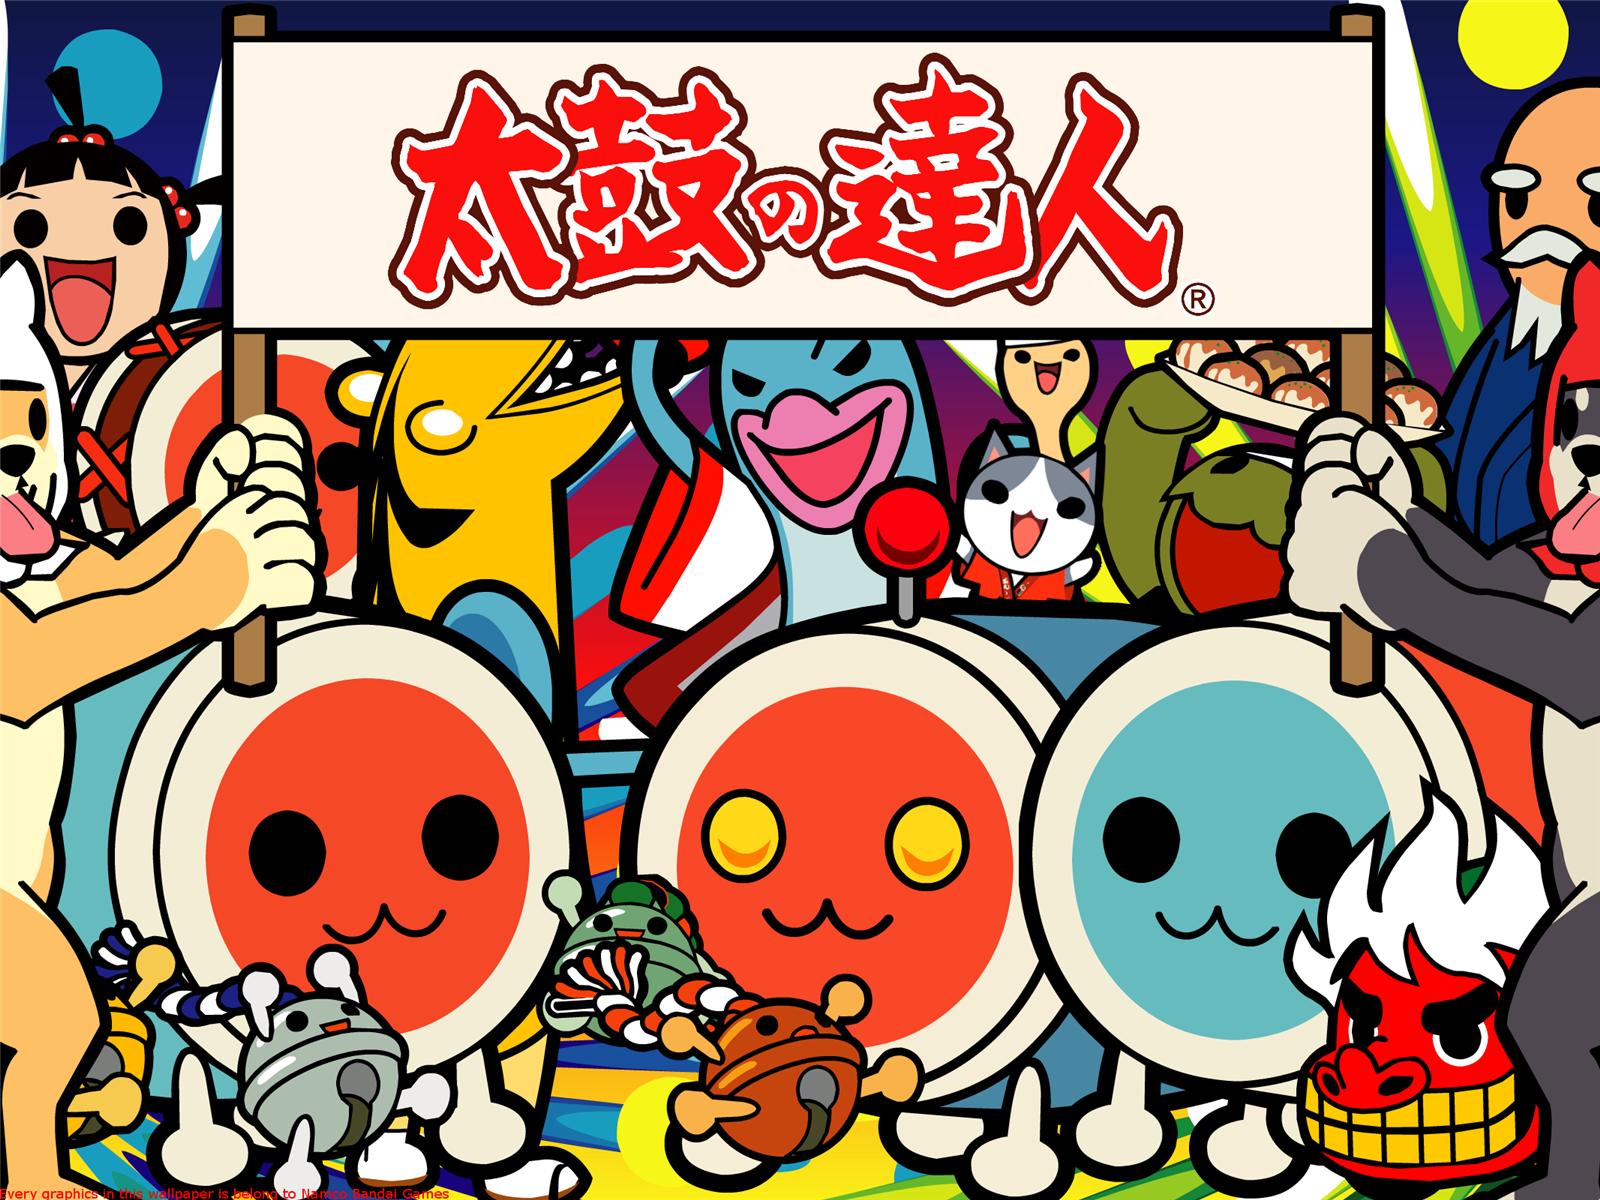 Taiko_no_Tatsujin___Fullscreen_by_aiaidevil